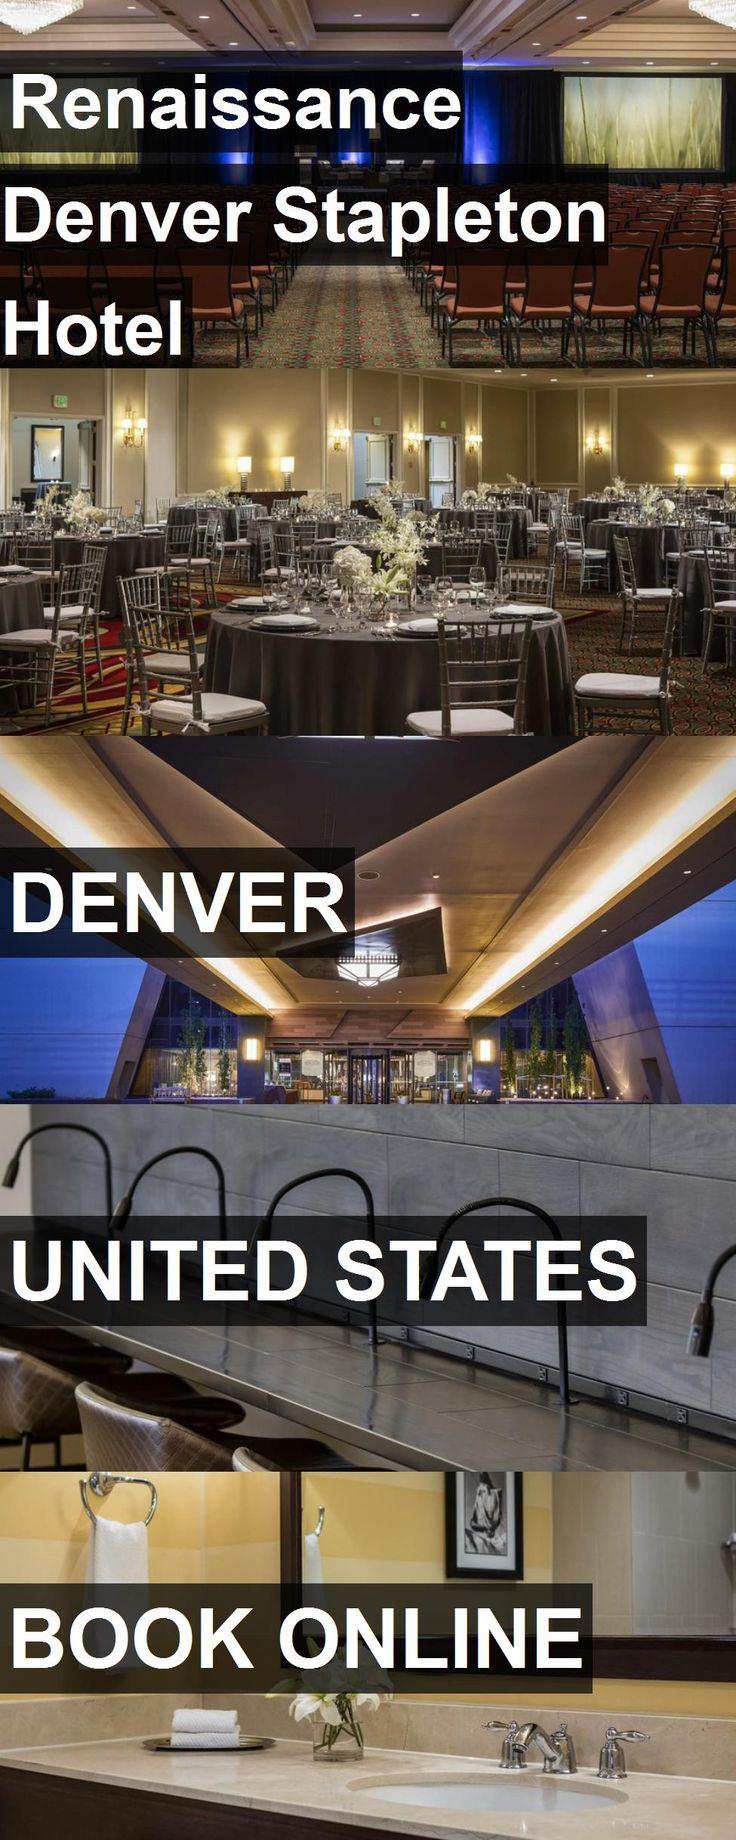 Renaissance Denver Stapleton Hotel in Denver, United States. For more information, photos, reviews and best prices please follow the link. #UnitedStates #Denver #travel #vacation #hotel